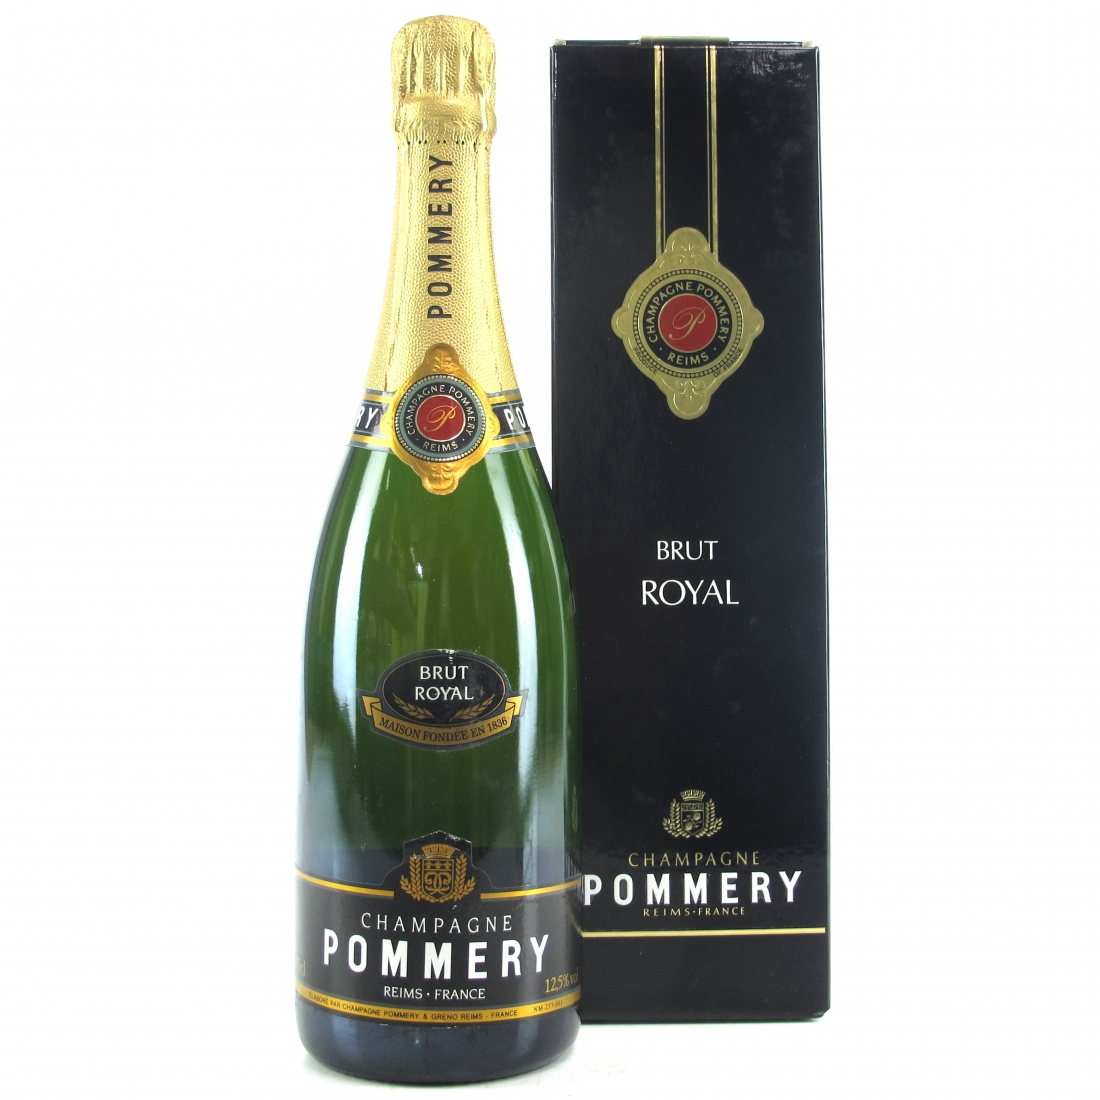 Pommery Brut Royal NV Champagne